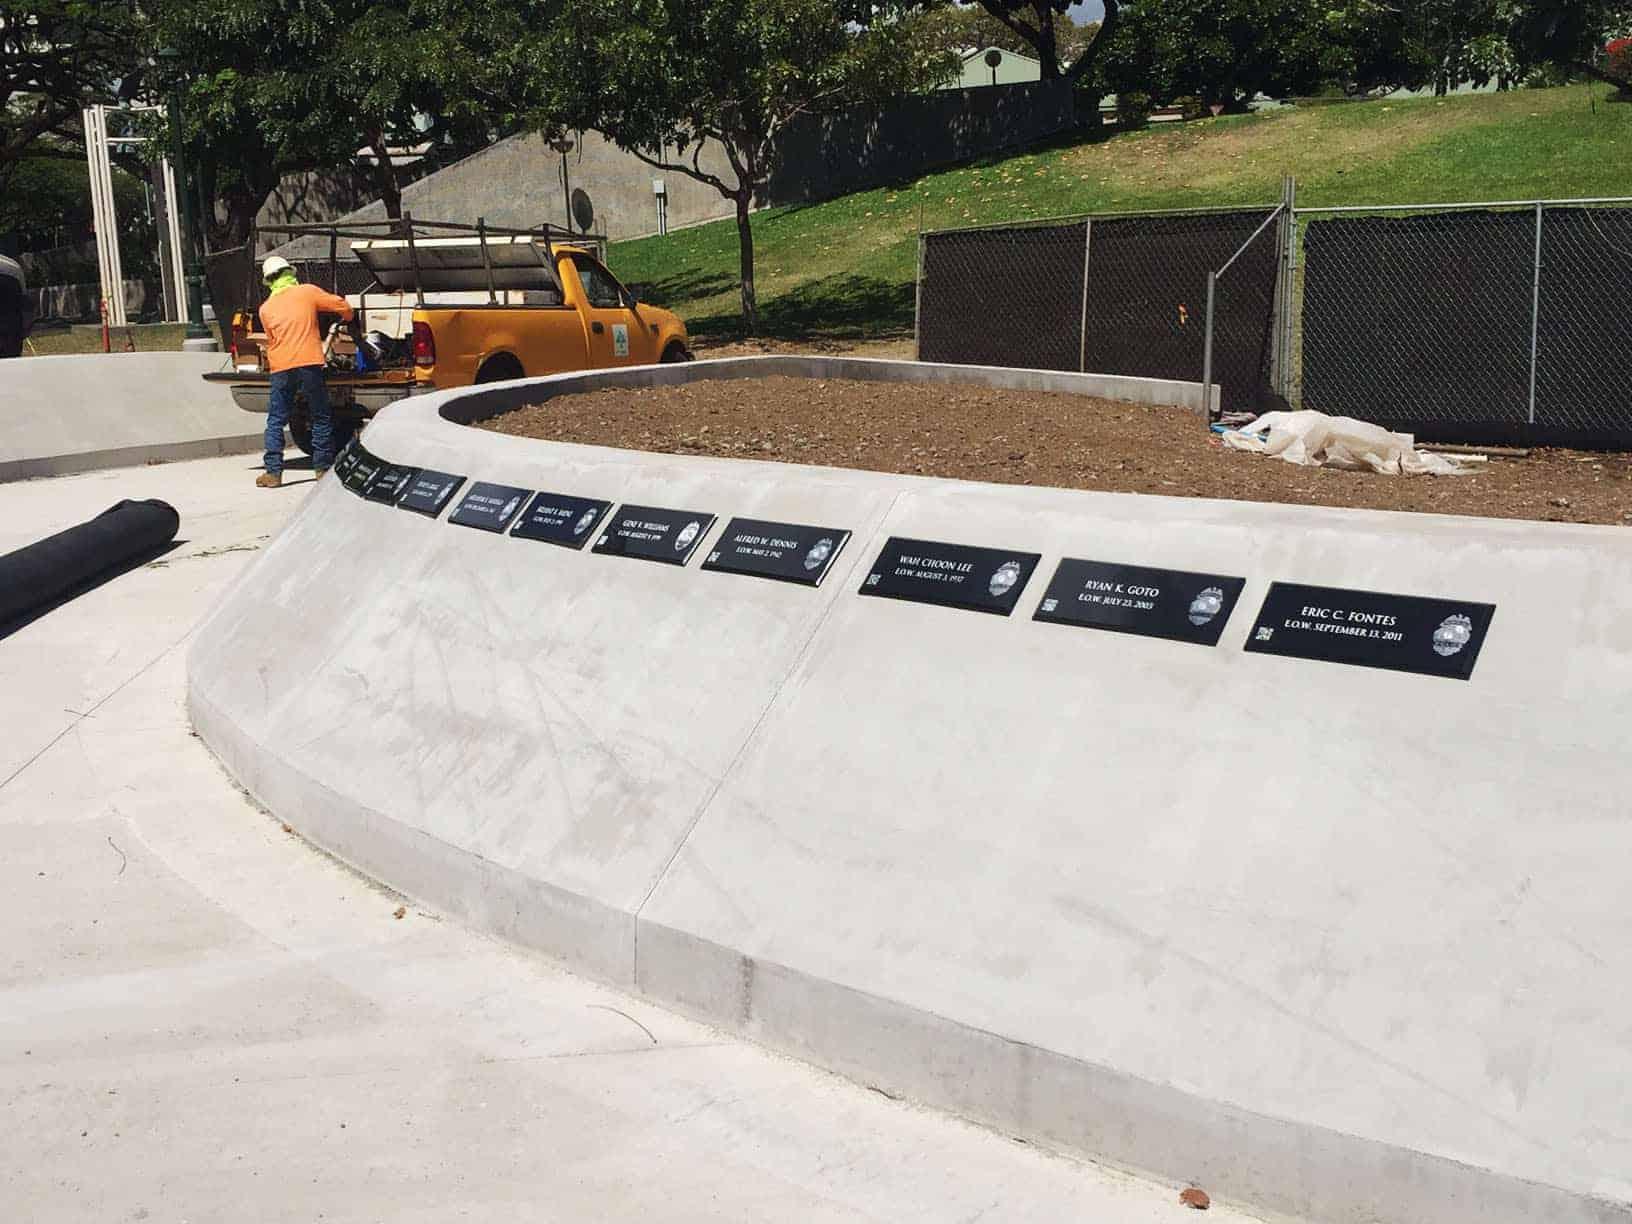 Hawaii Fallen Law Enforcement Officer Memorial